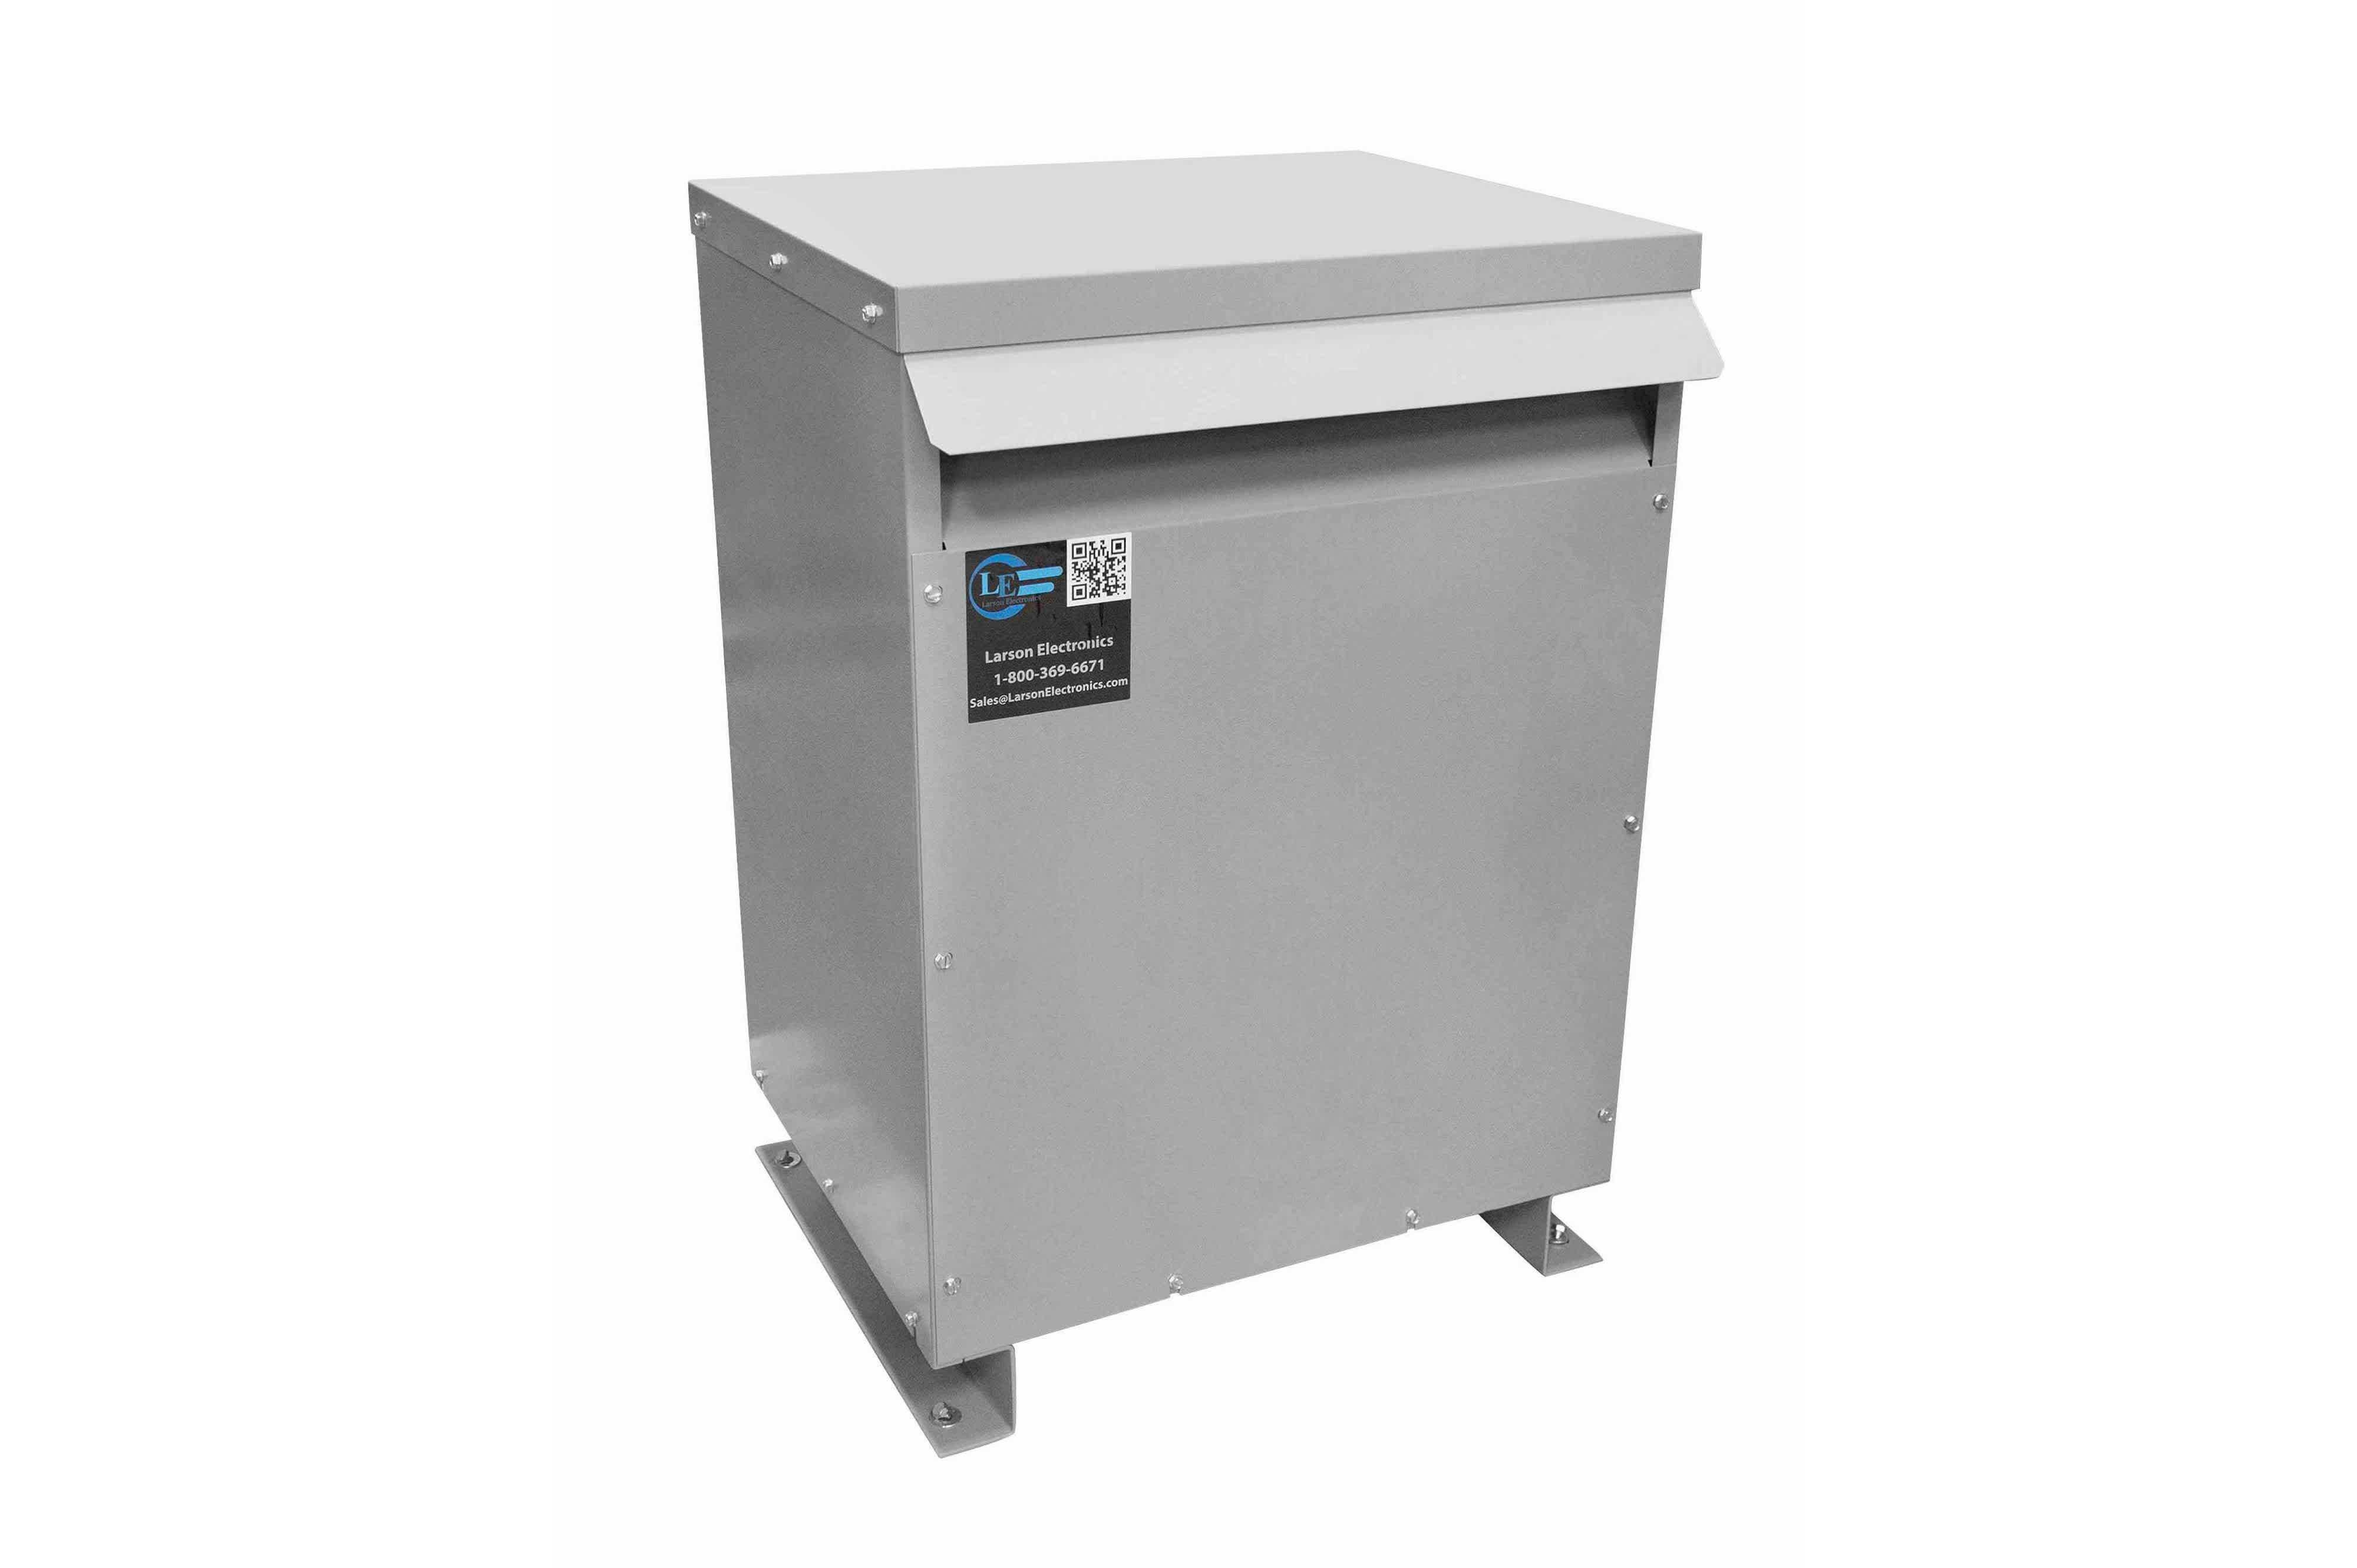 112.5 kVA 3PH Isolation Transformer, 440V Wye Primary, 208Y/120 Wye-N Secondary, N3R, Ventilated, 60 Hz